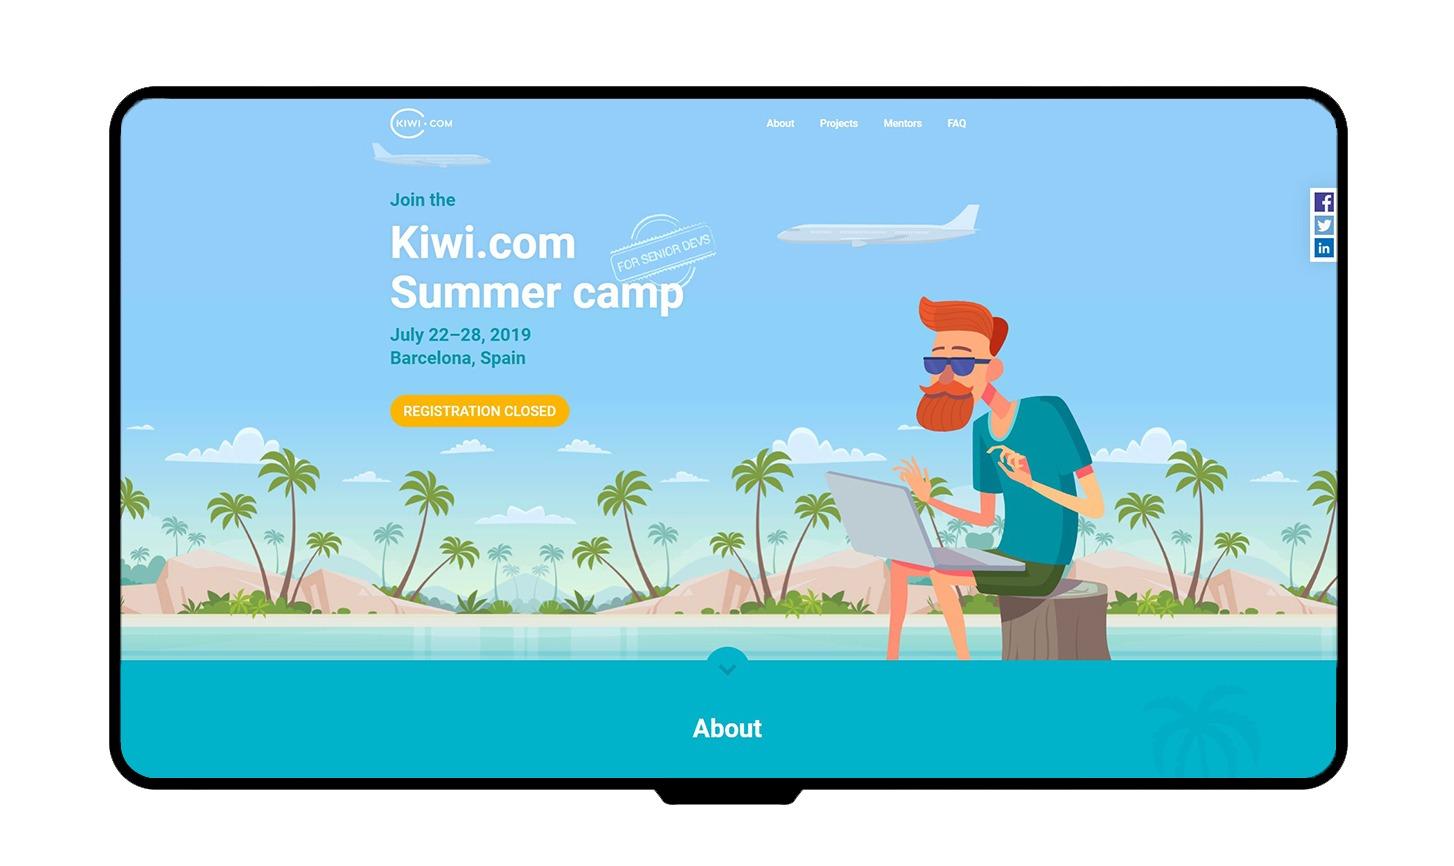 Kiwi.com - Summer camp mockup